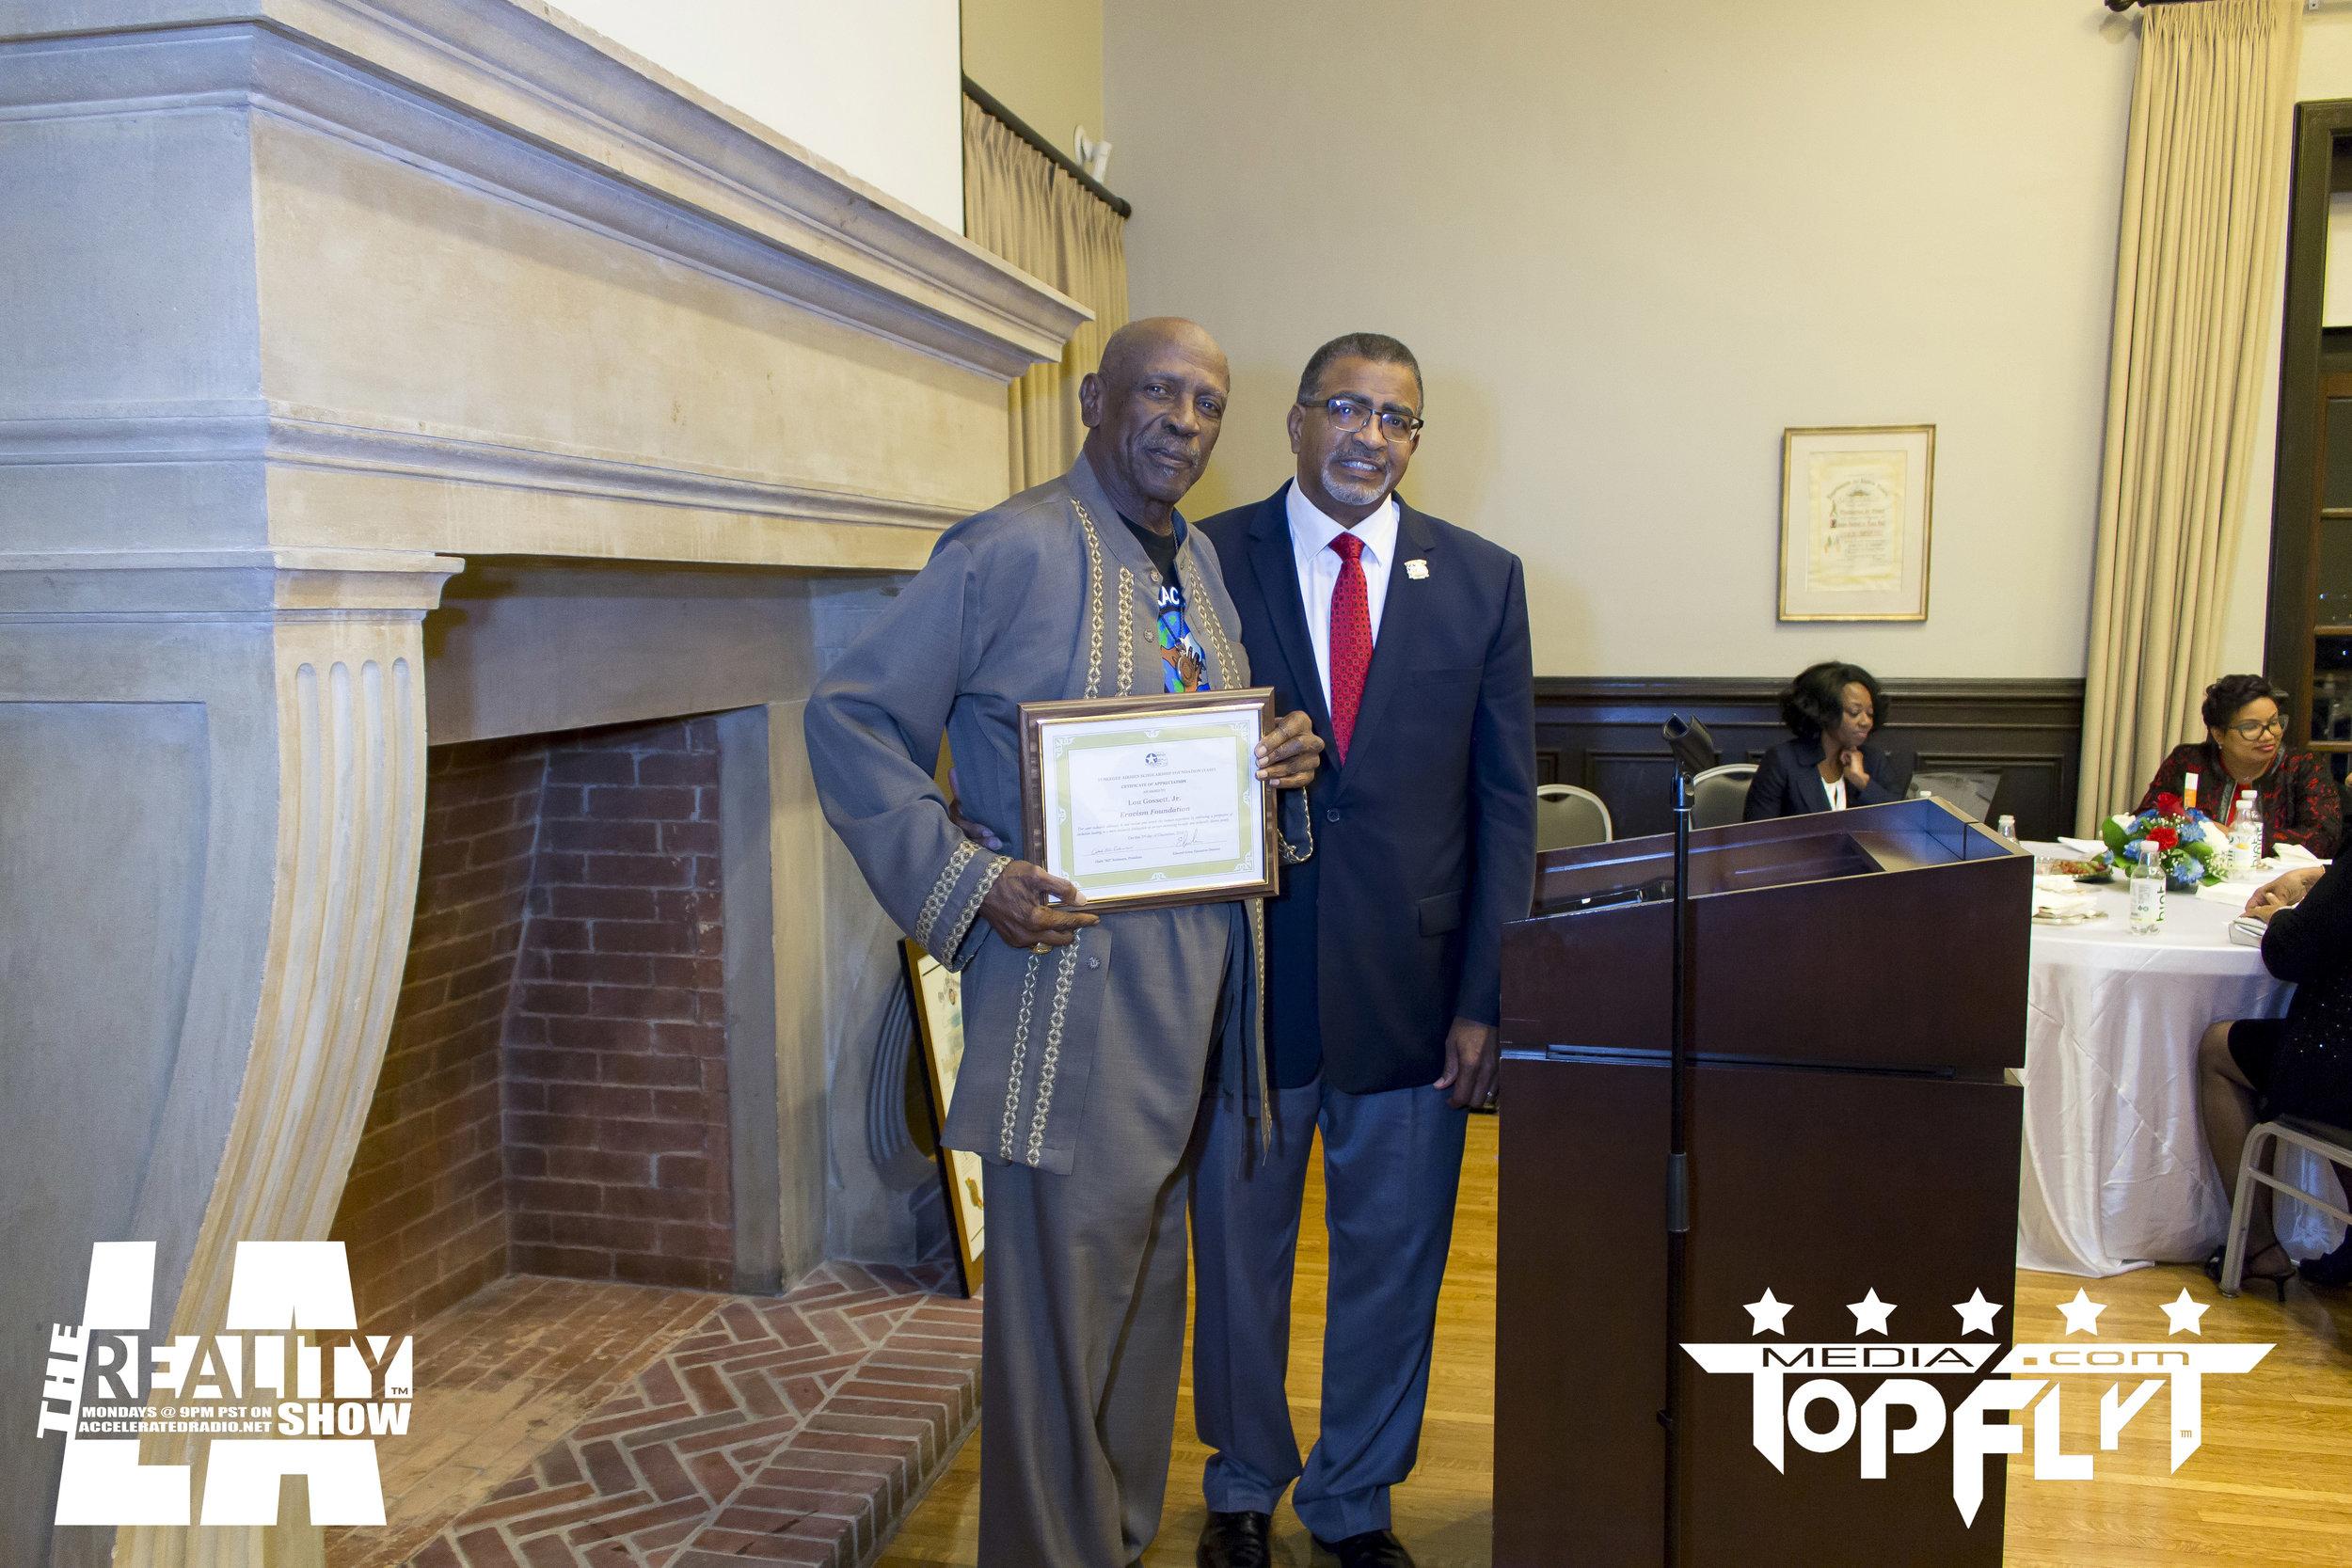 The Reality Show LA - Tuskegee Airmen 75th Anniversary VIP Reception_134.jpg